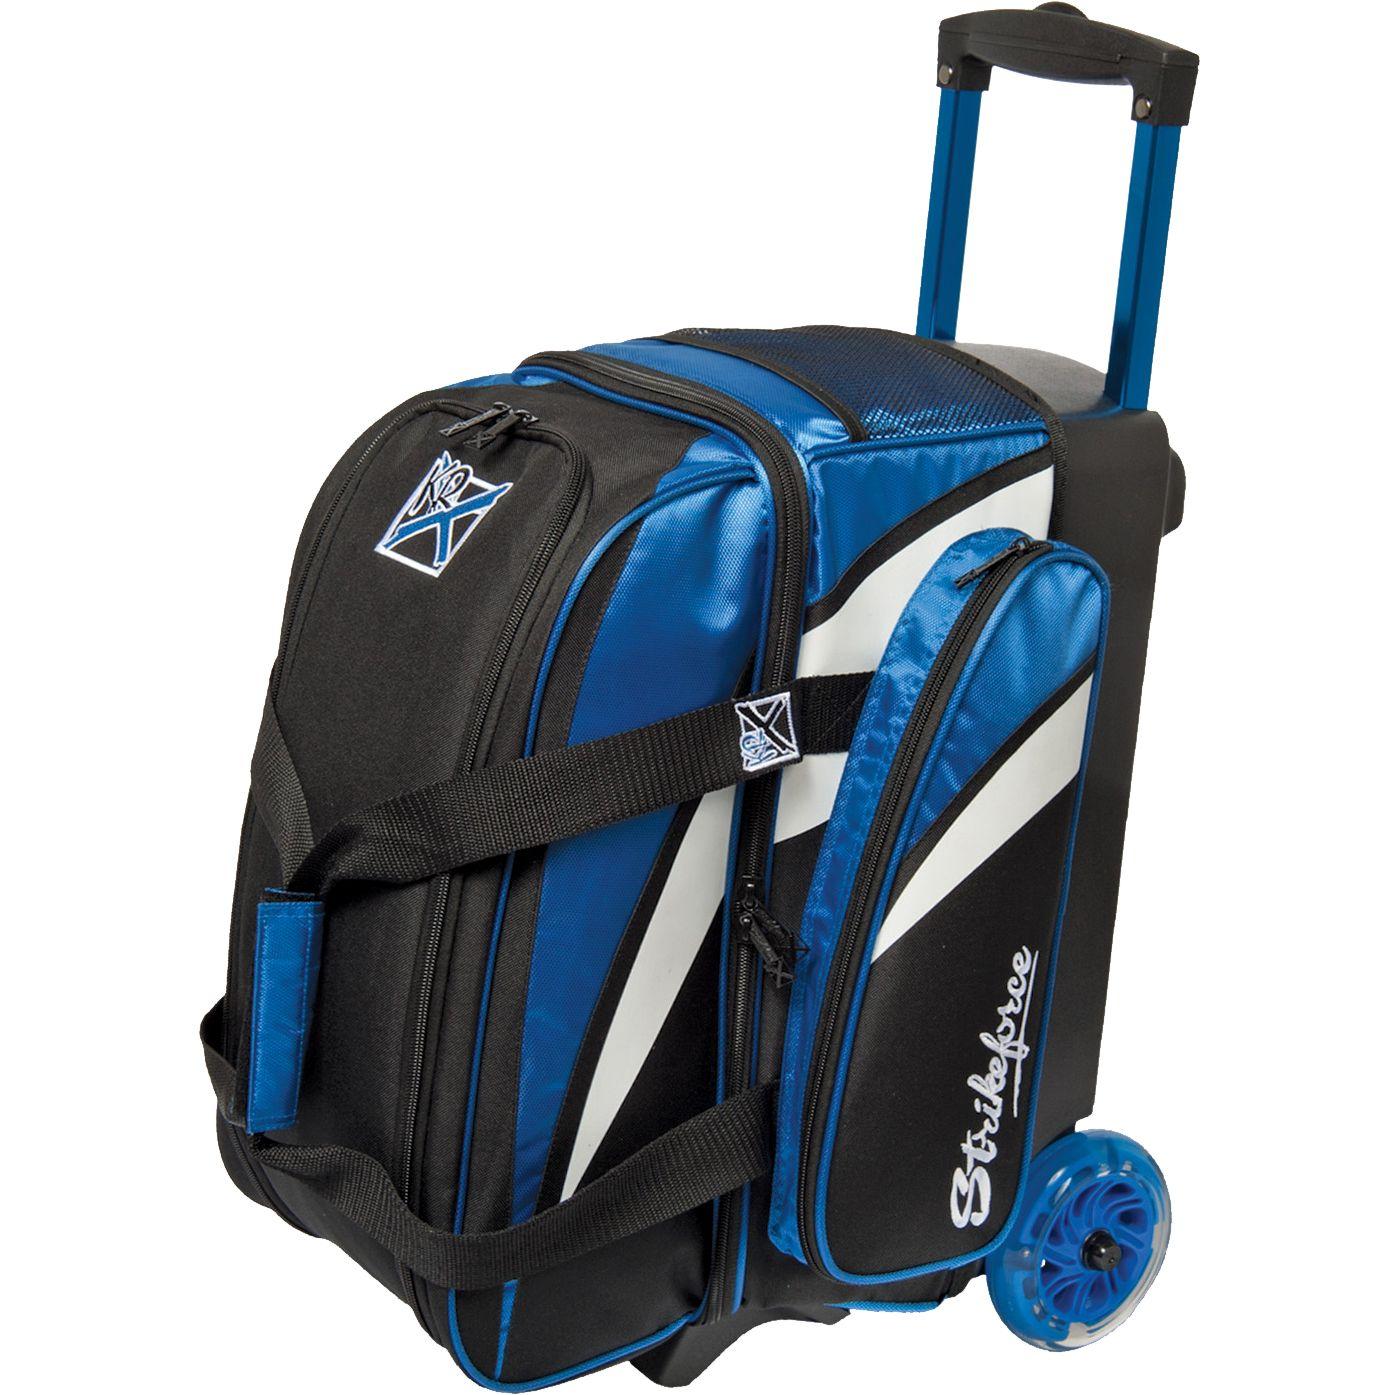 KR Strikeforce Cruiser Smooth 2-Ball Roller Bowling Bag